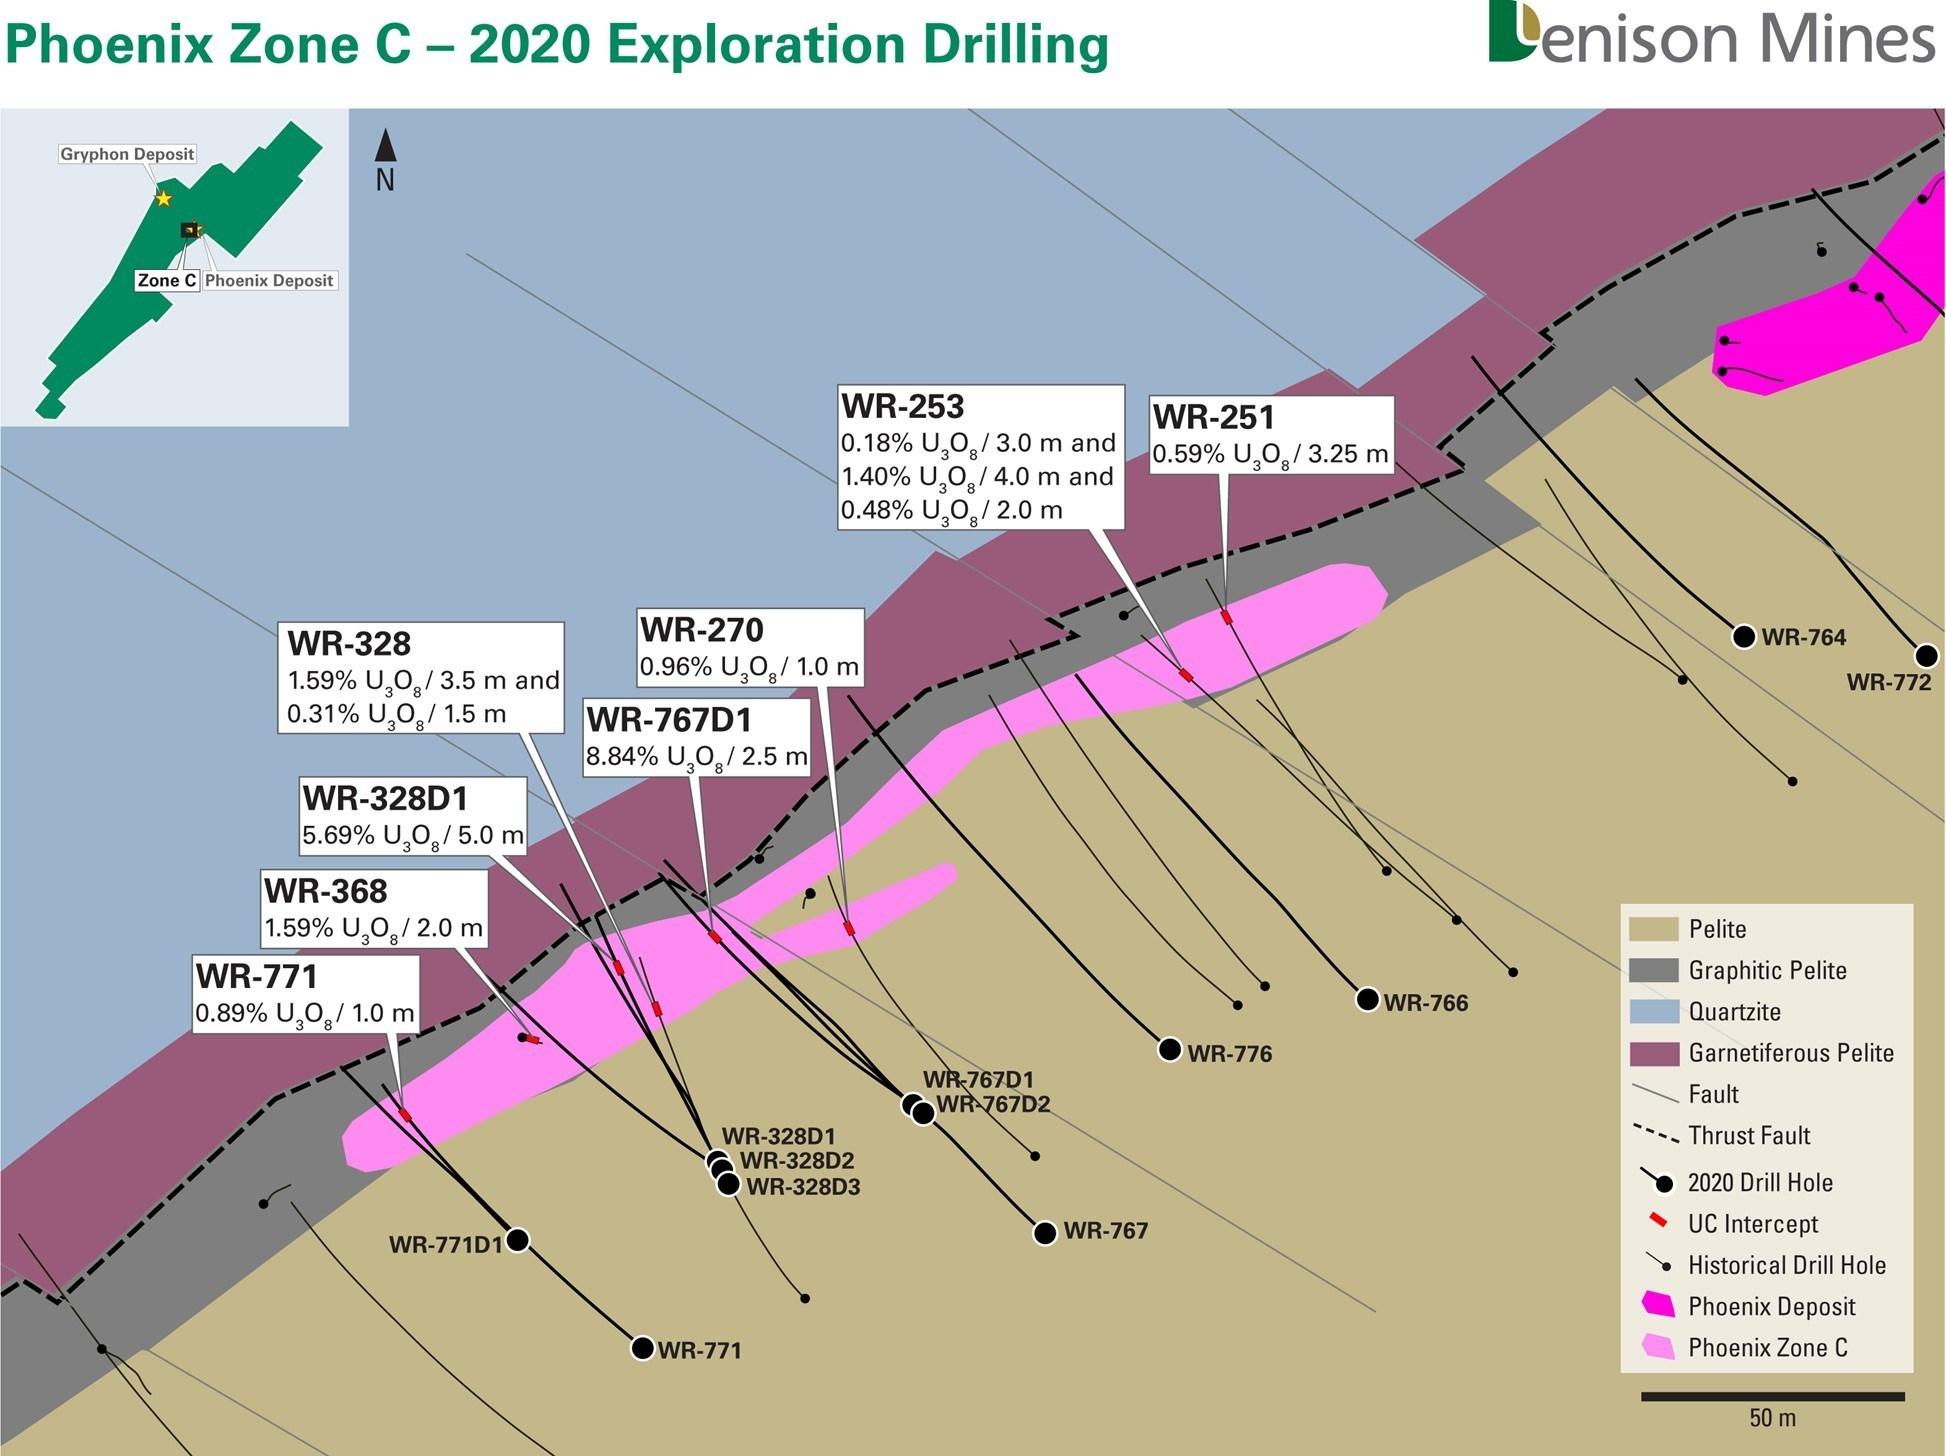 Figure 2 - Phoenix Zone C – 2020 Exploration Drilling (CNW Group/Denison Mines Corp.)